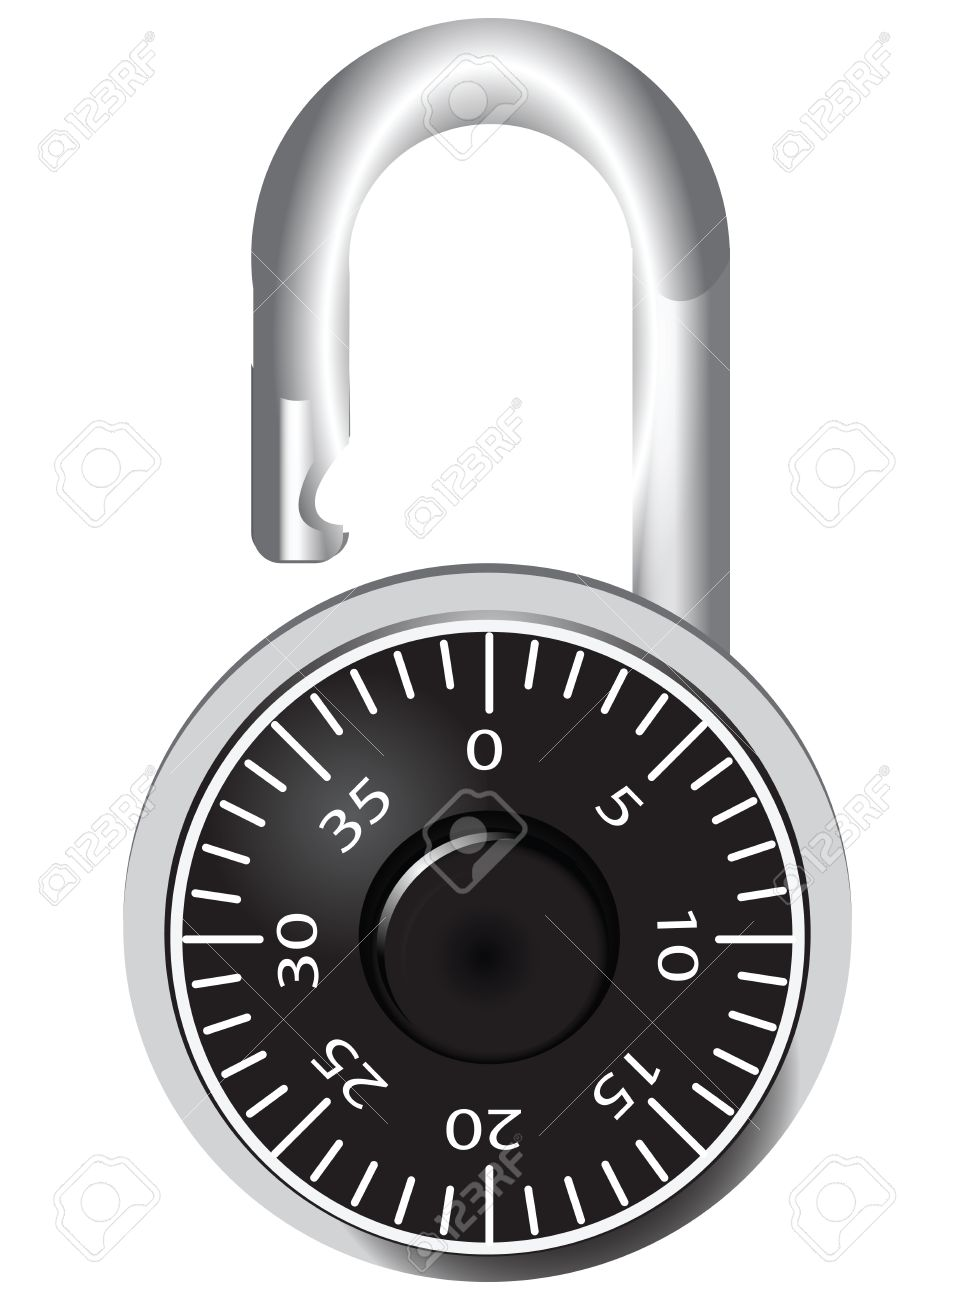 Digital door lock for rooms and lockers. Vector illustration. Stock Vector - 17276176